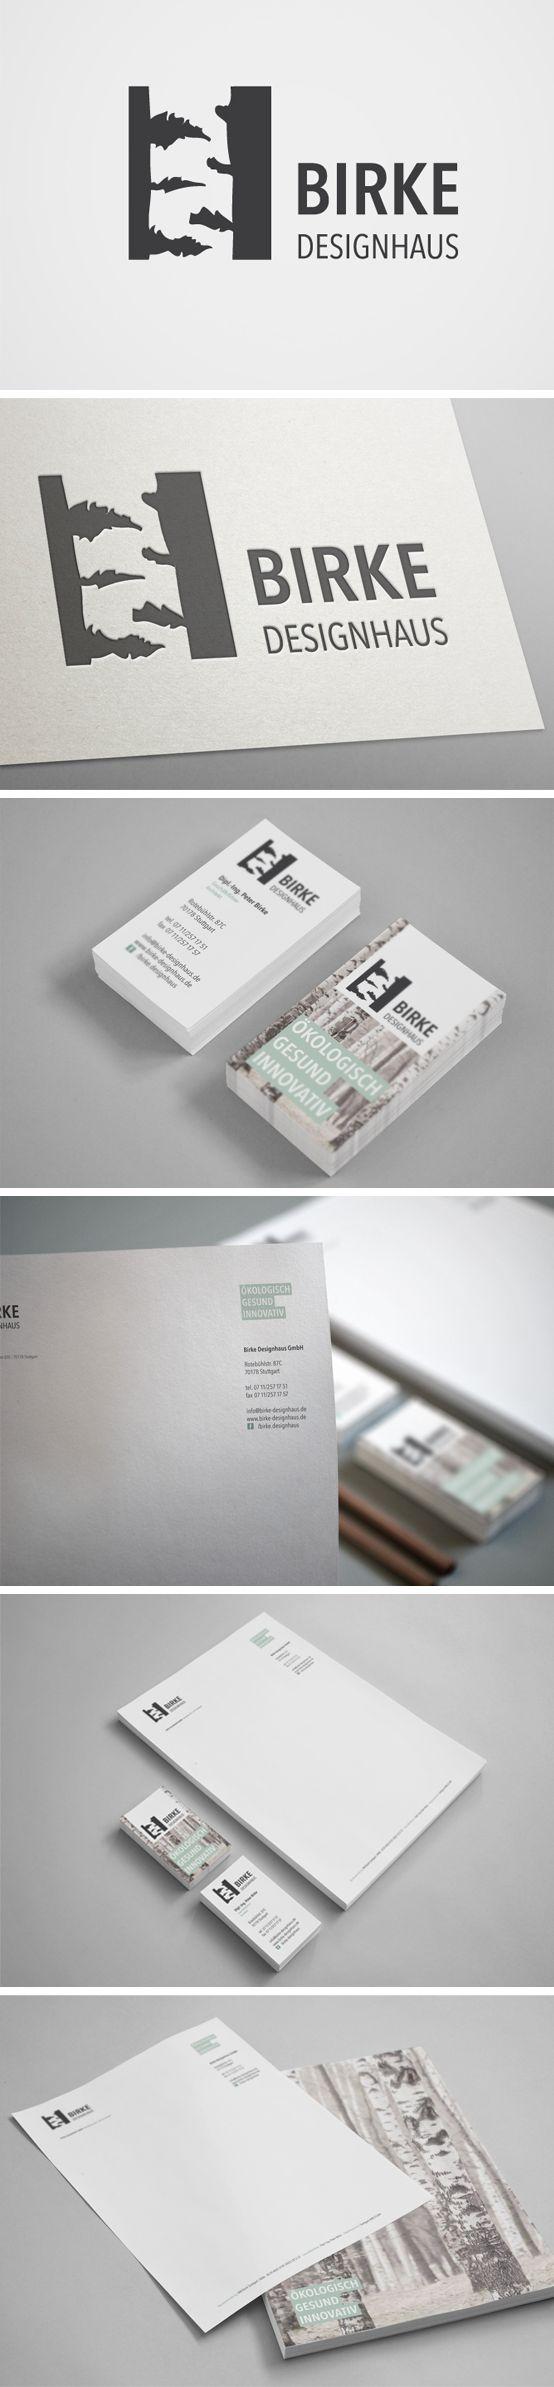 Corporate Design für Birke Designhaus | #stationary #corporate #design #corporatedesign #logo #identity #branding #letterhead #briefpapier #visitenkarte #business card #Germany | made with love in Stuttgart by www.smoco.de